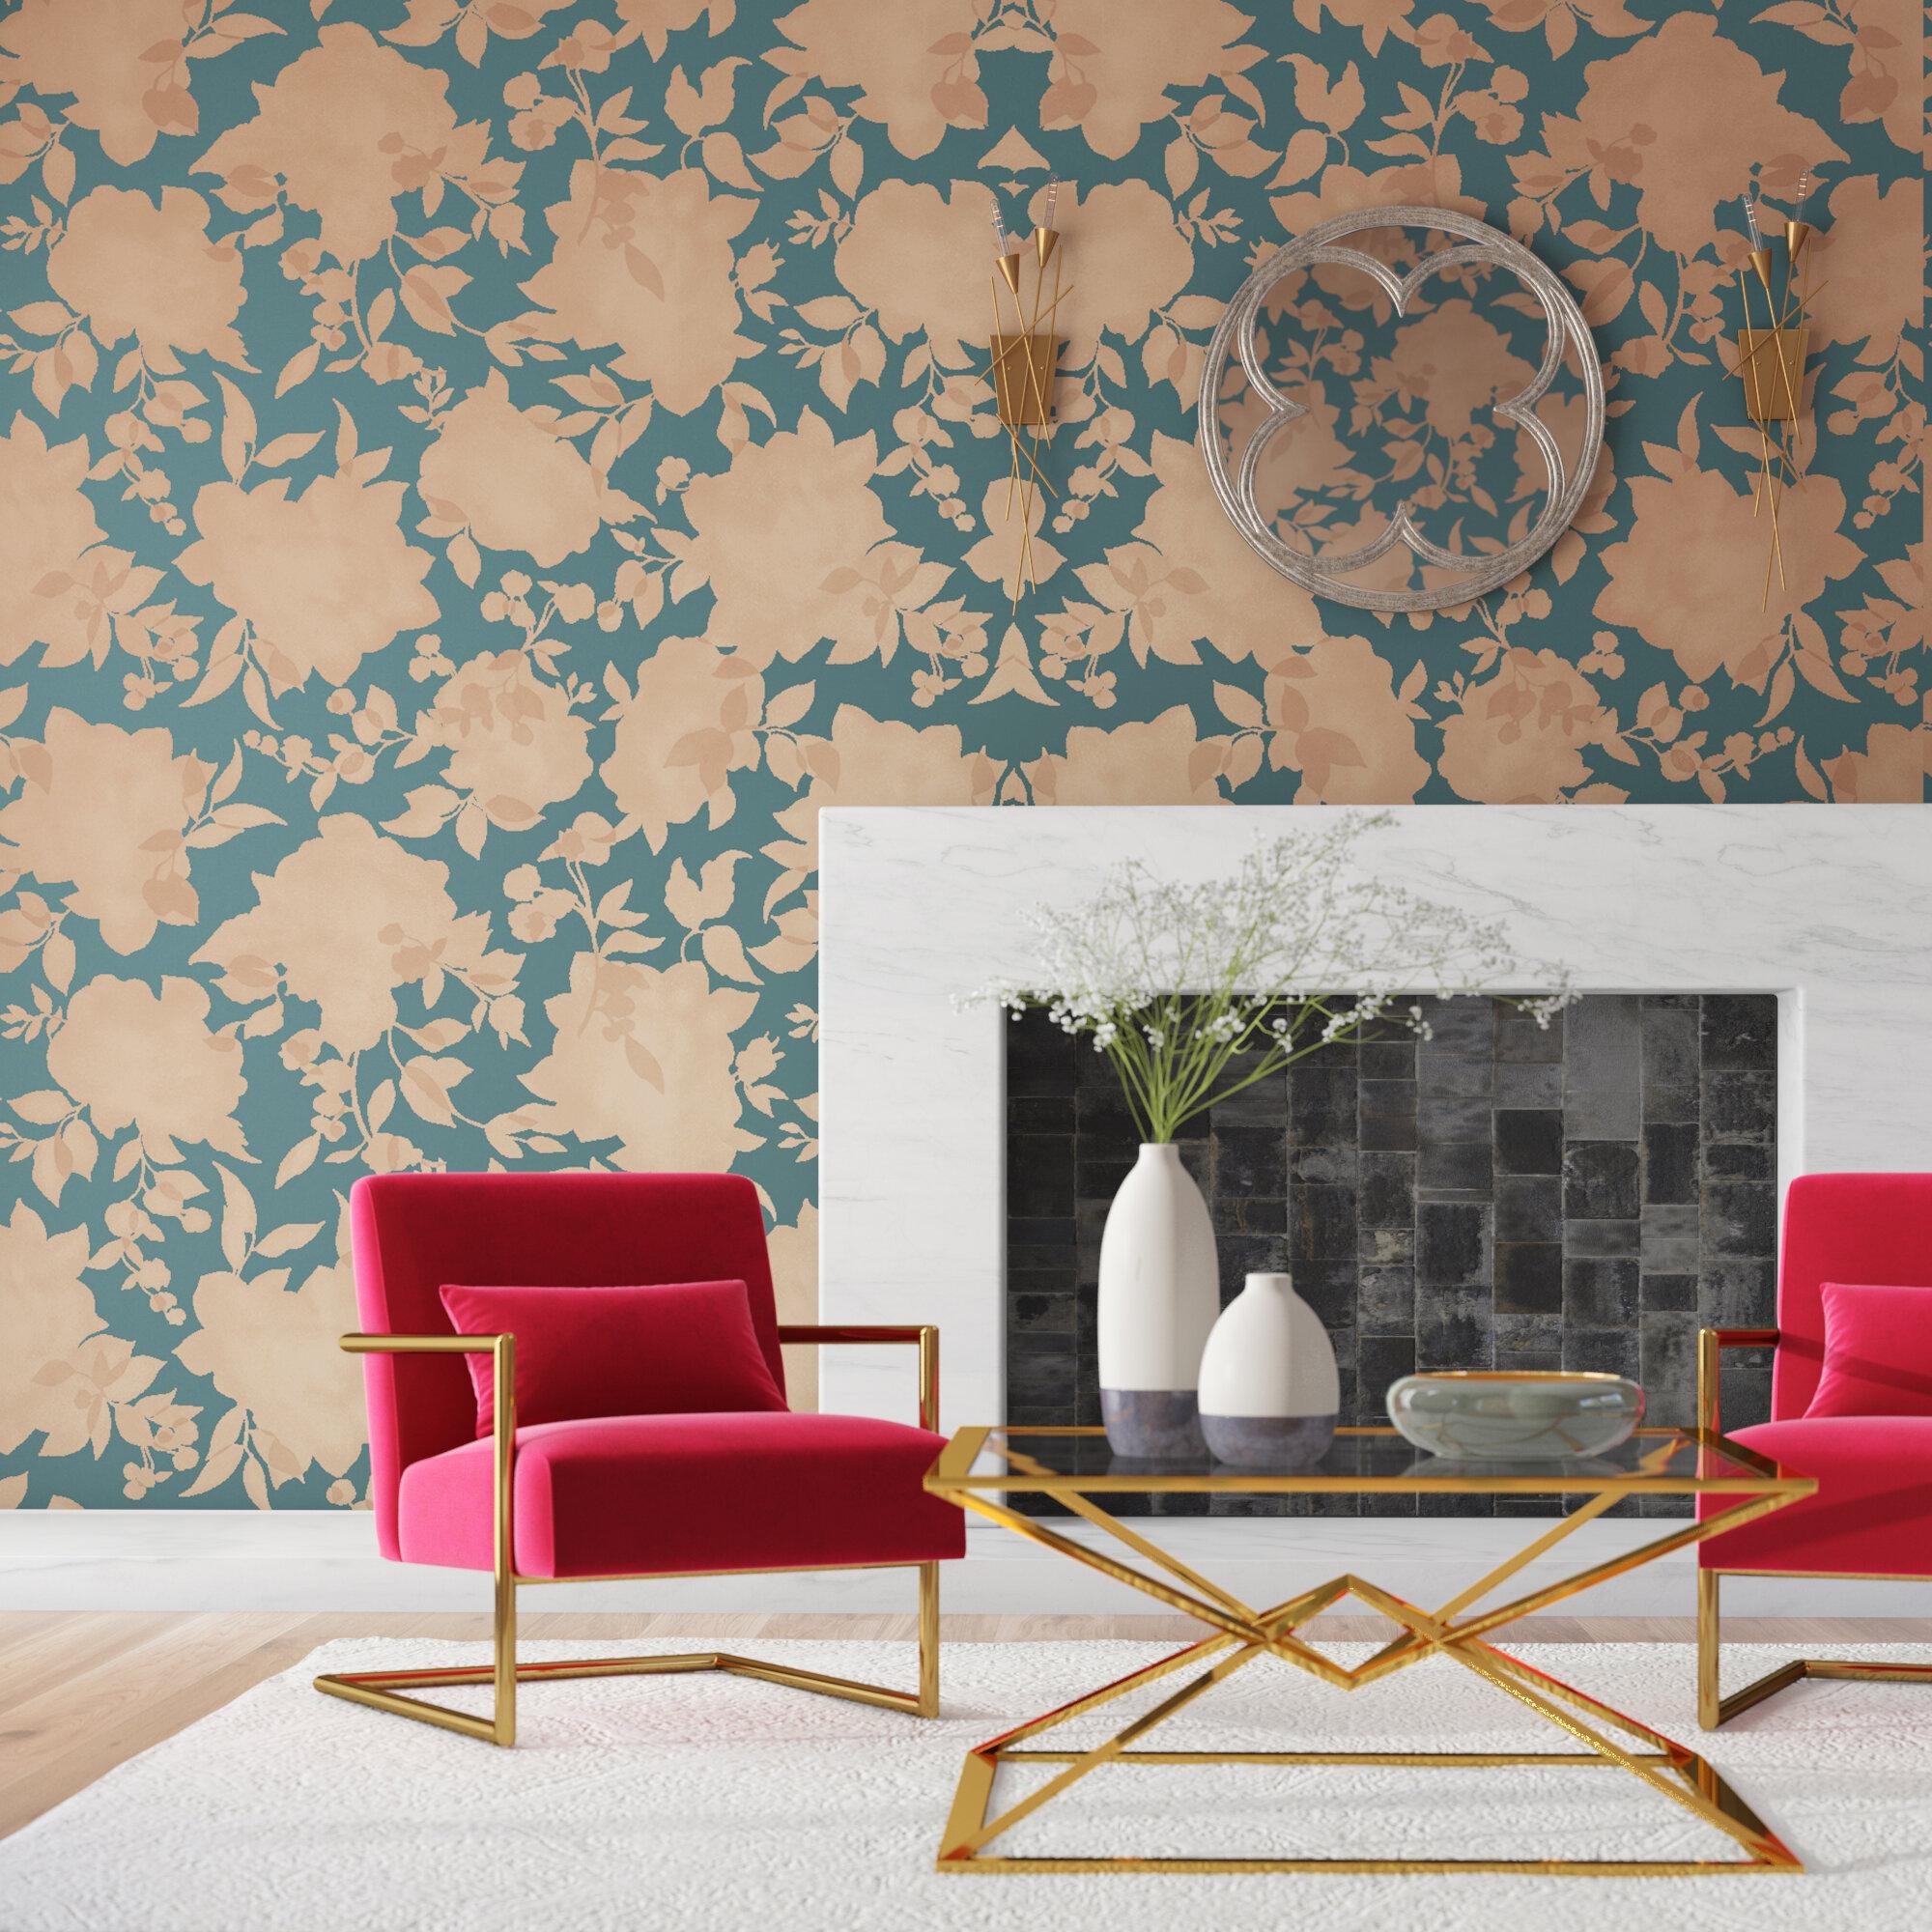 foto de Floral & Botanical Wallpaper You'll Love in 2020 | Wayfair